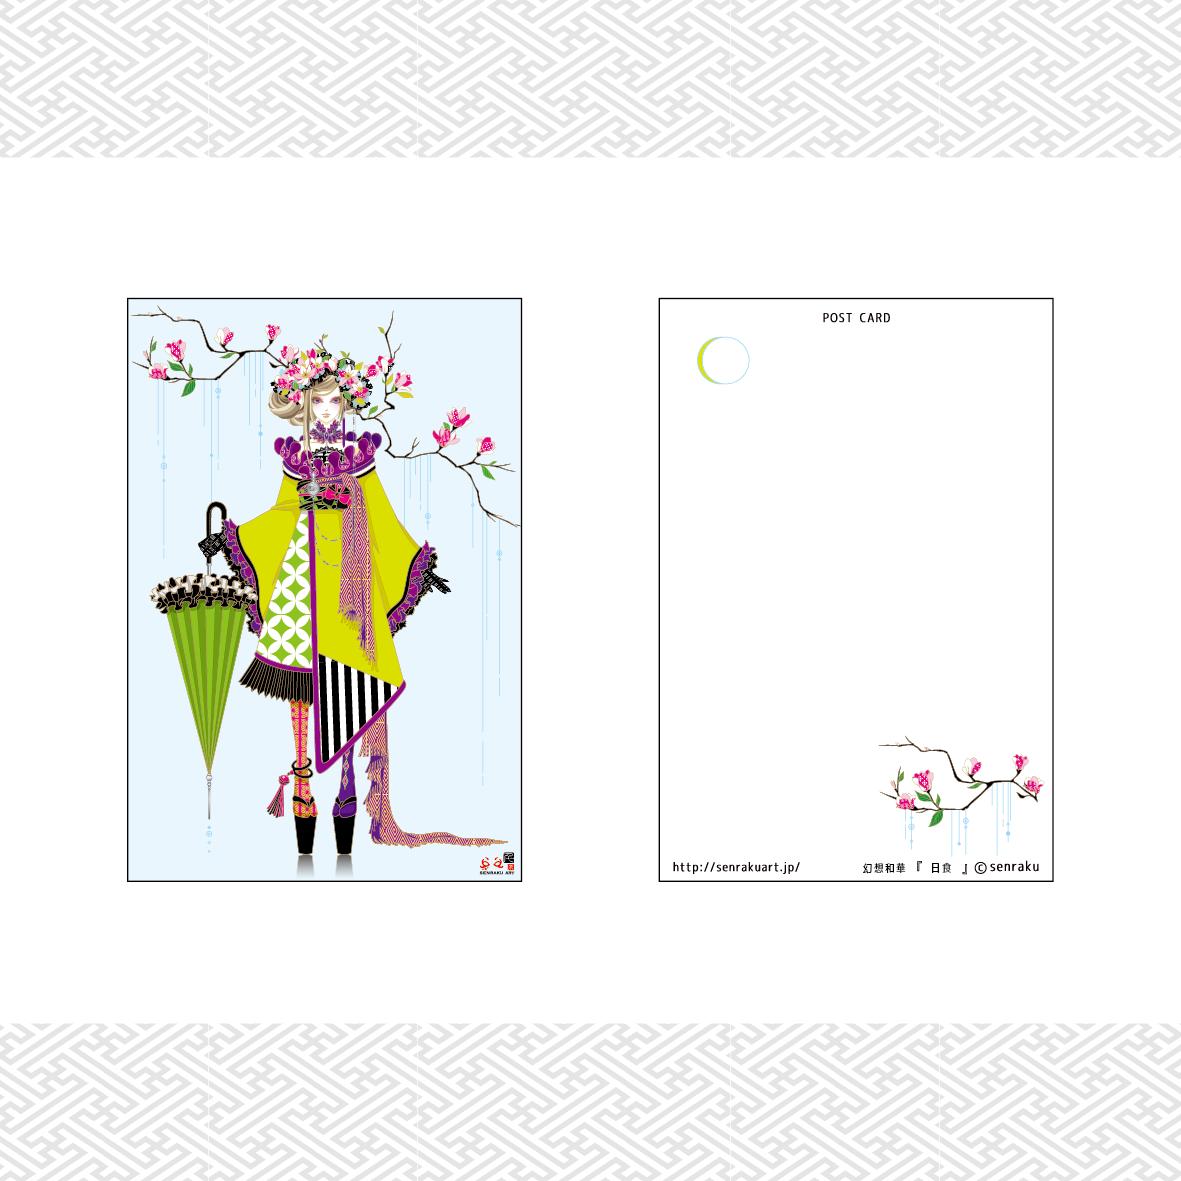 POST CARD SAMPLE